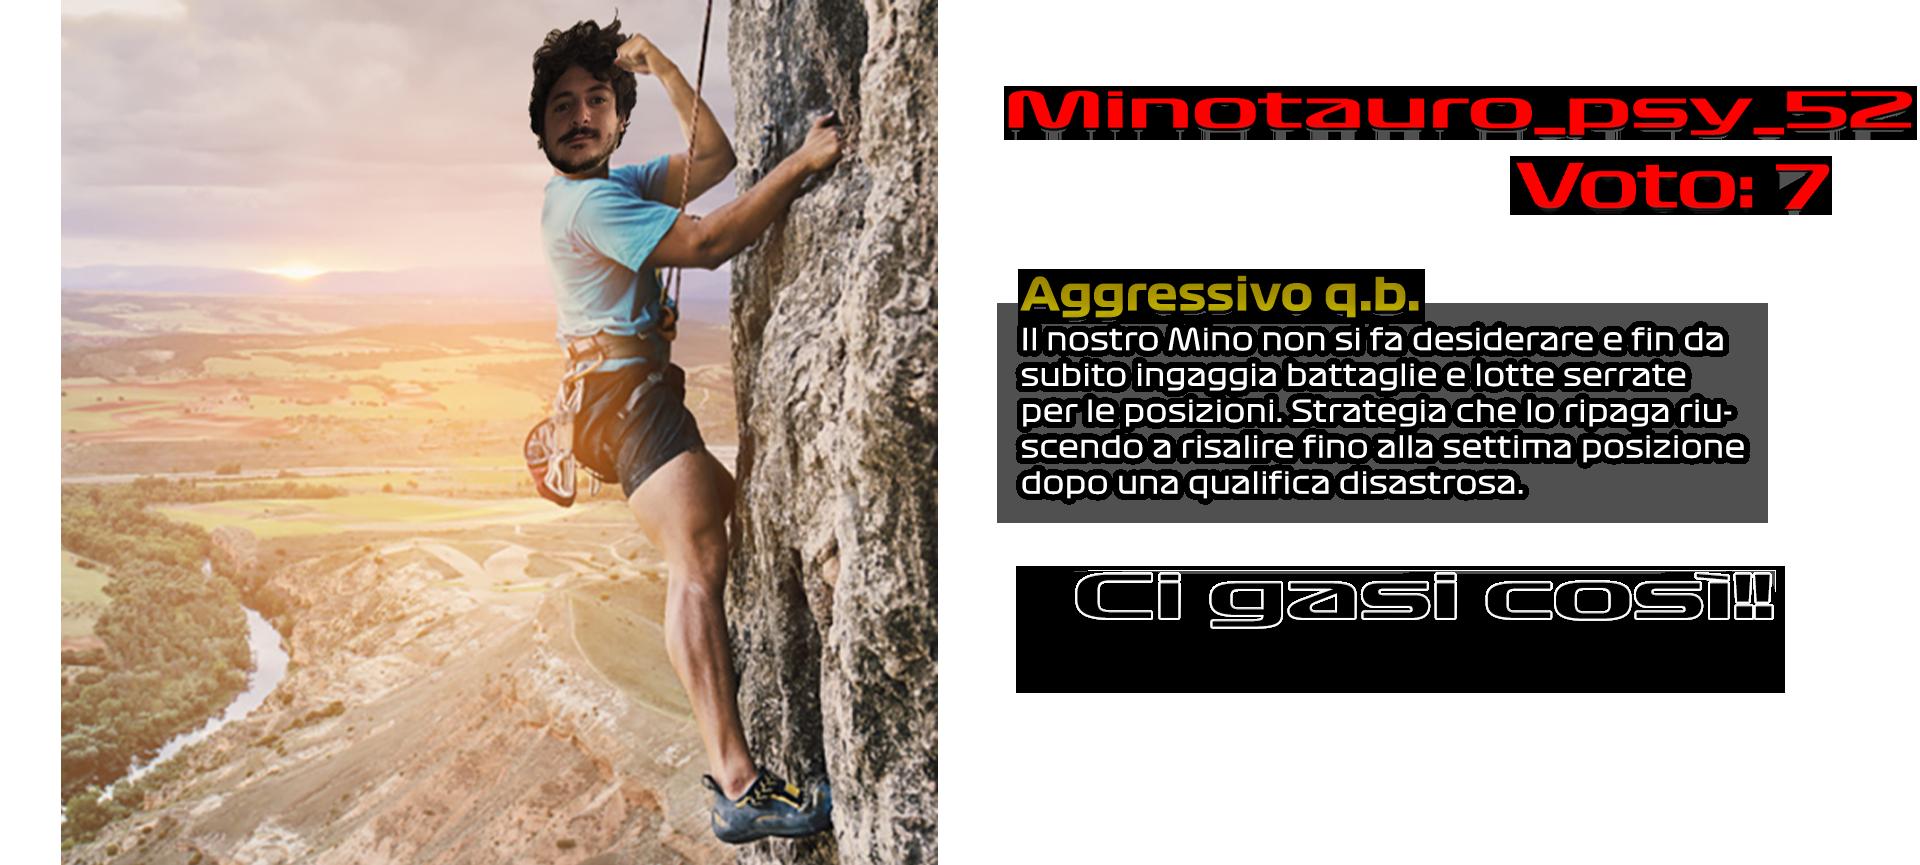 Garetta stasera random GT6-5-minotauro-png